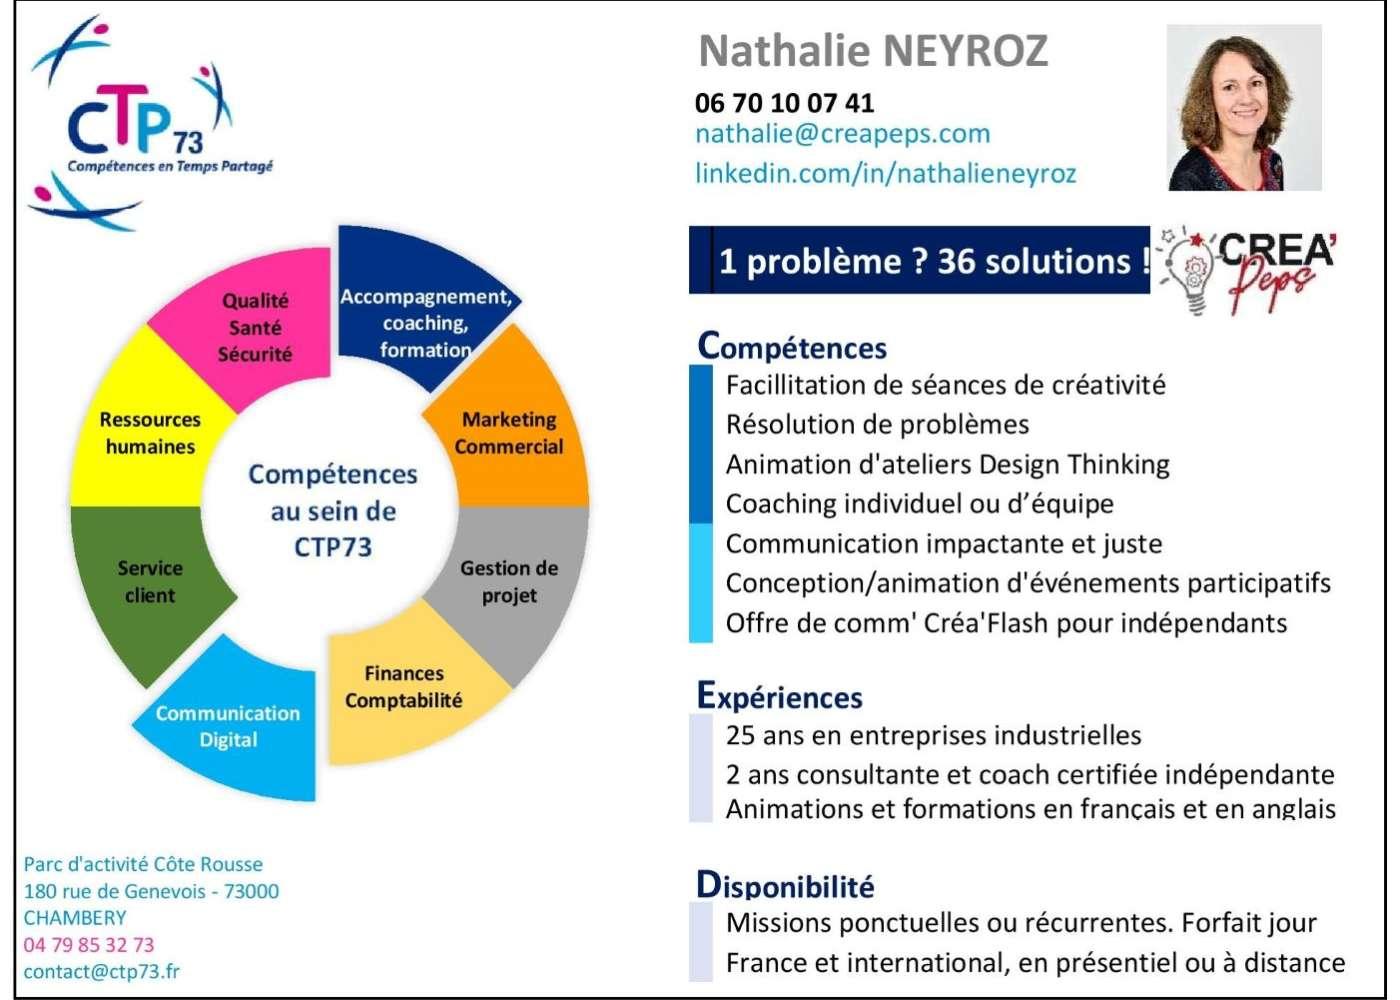 201202_CTP73 Offre compétences Nathalie Neyroz